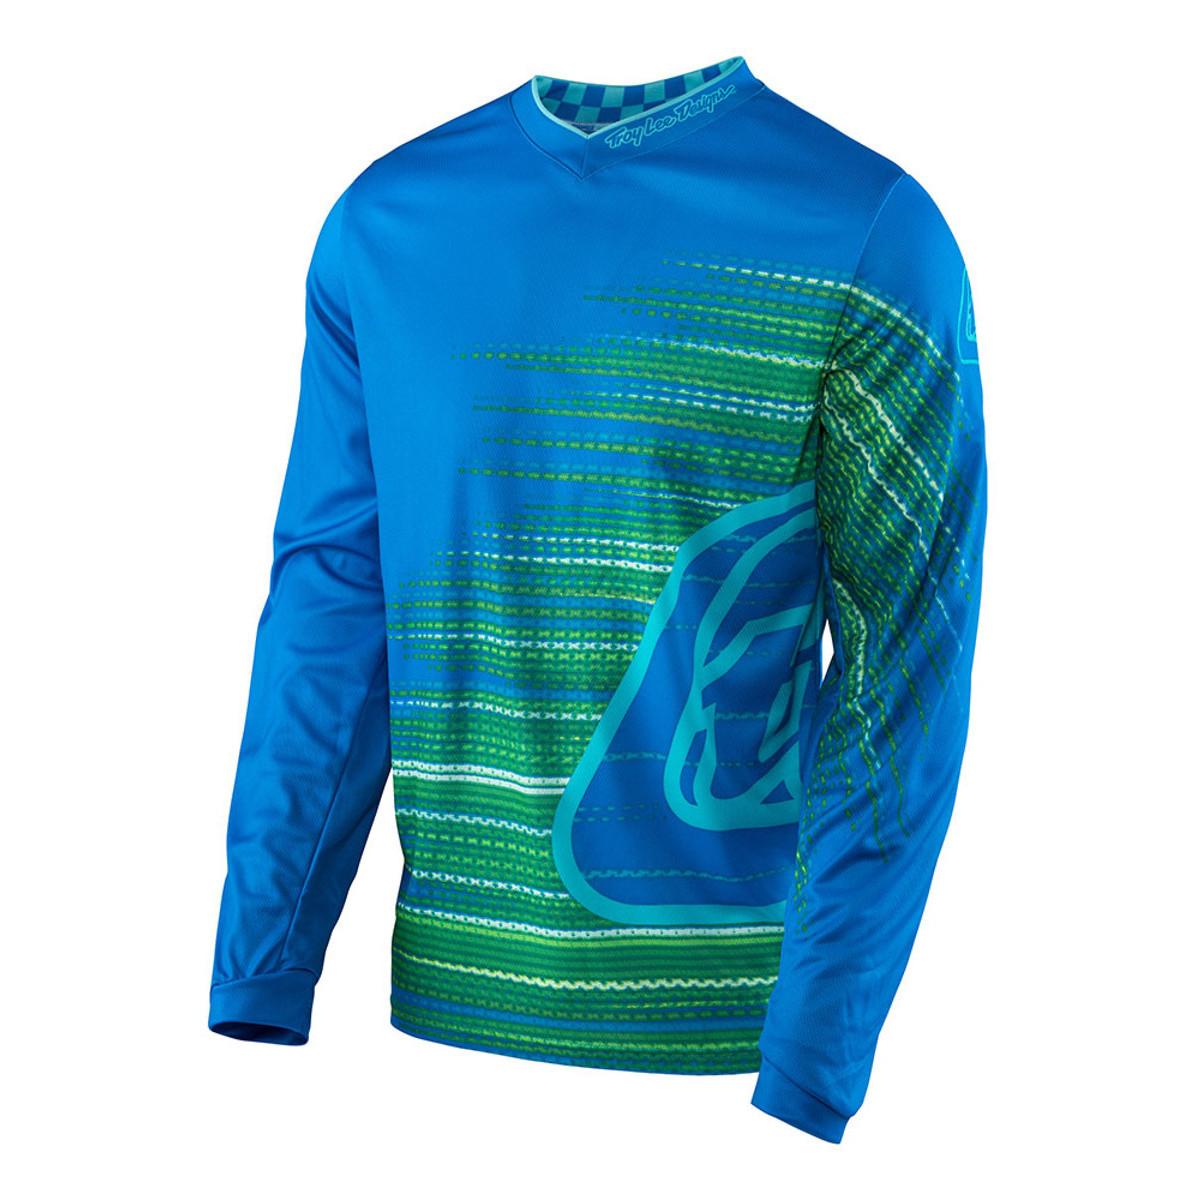 Troy Lee Designs GP Electro Jersey Troy Lee Designs GP Electro Blue